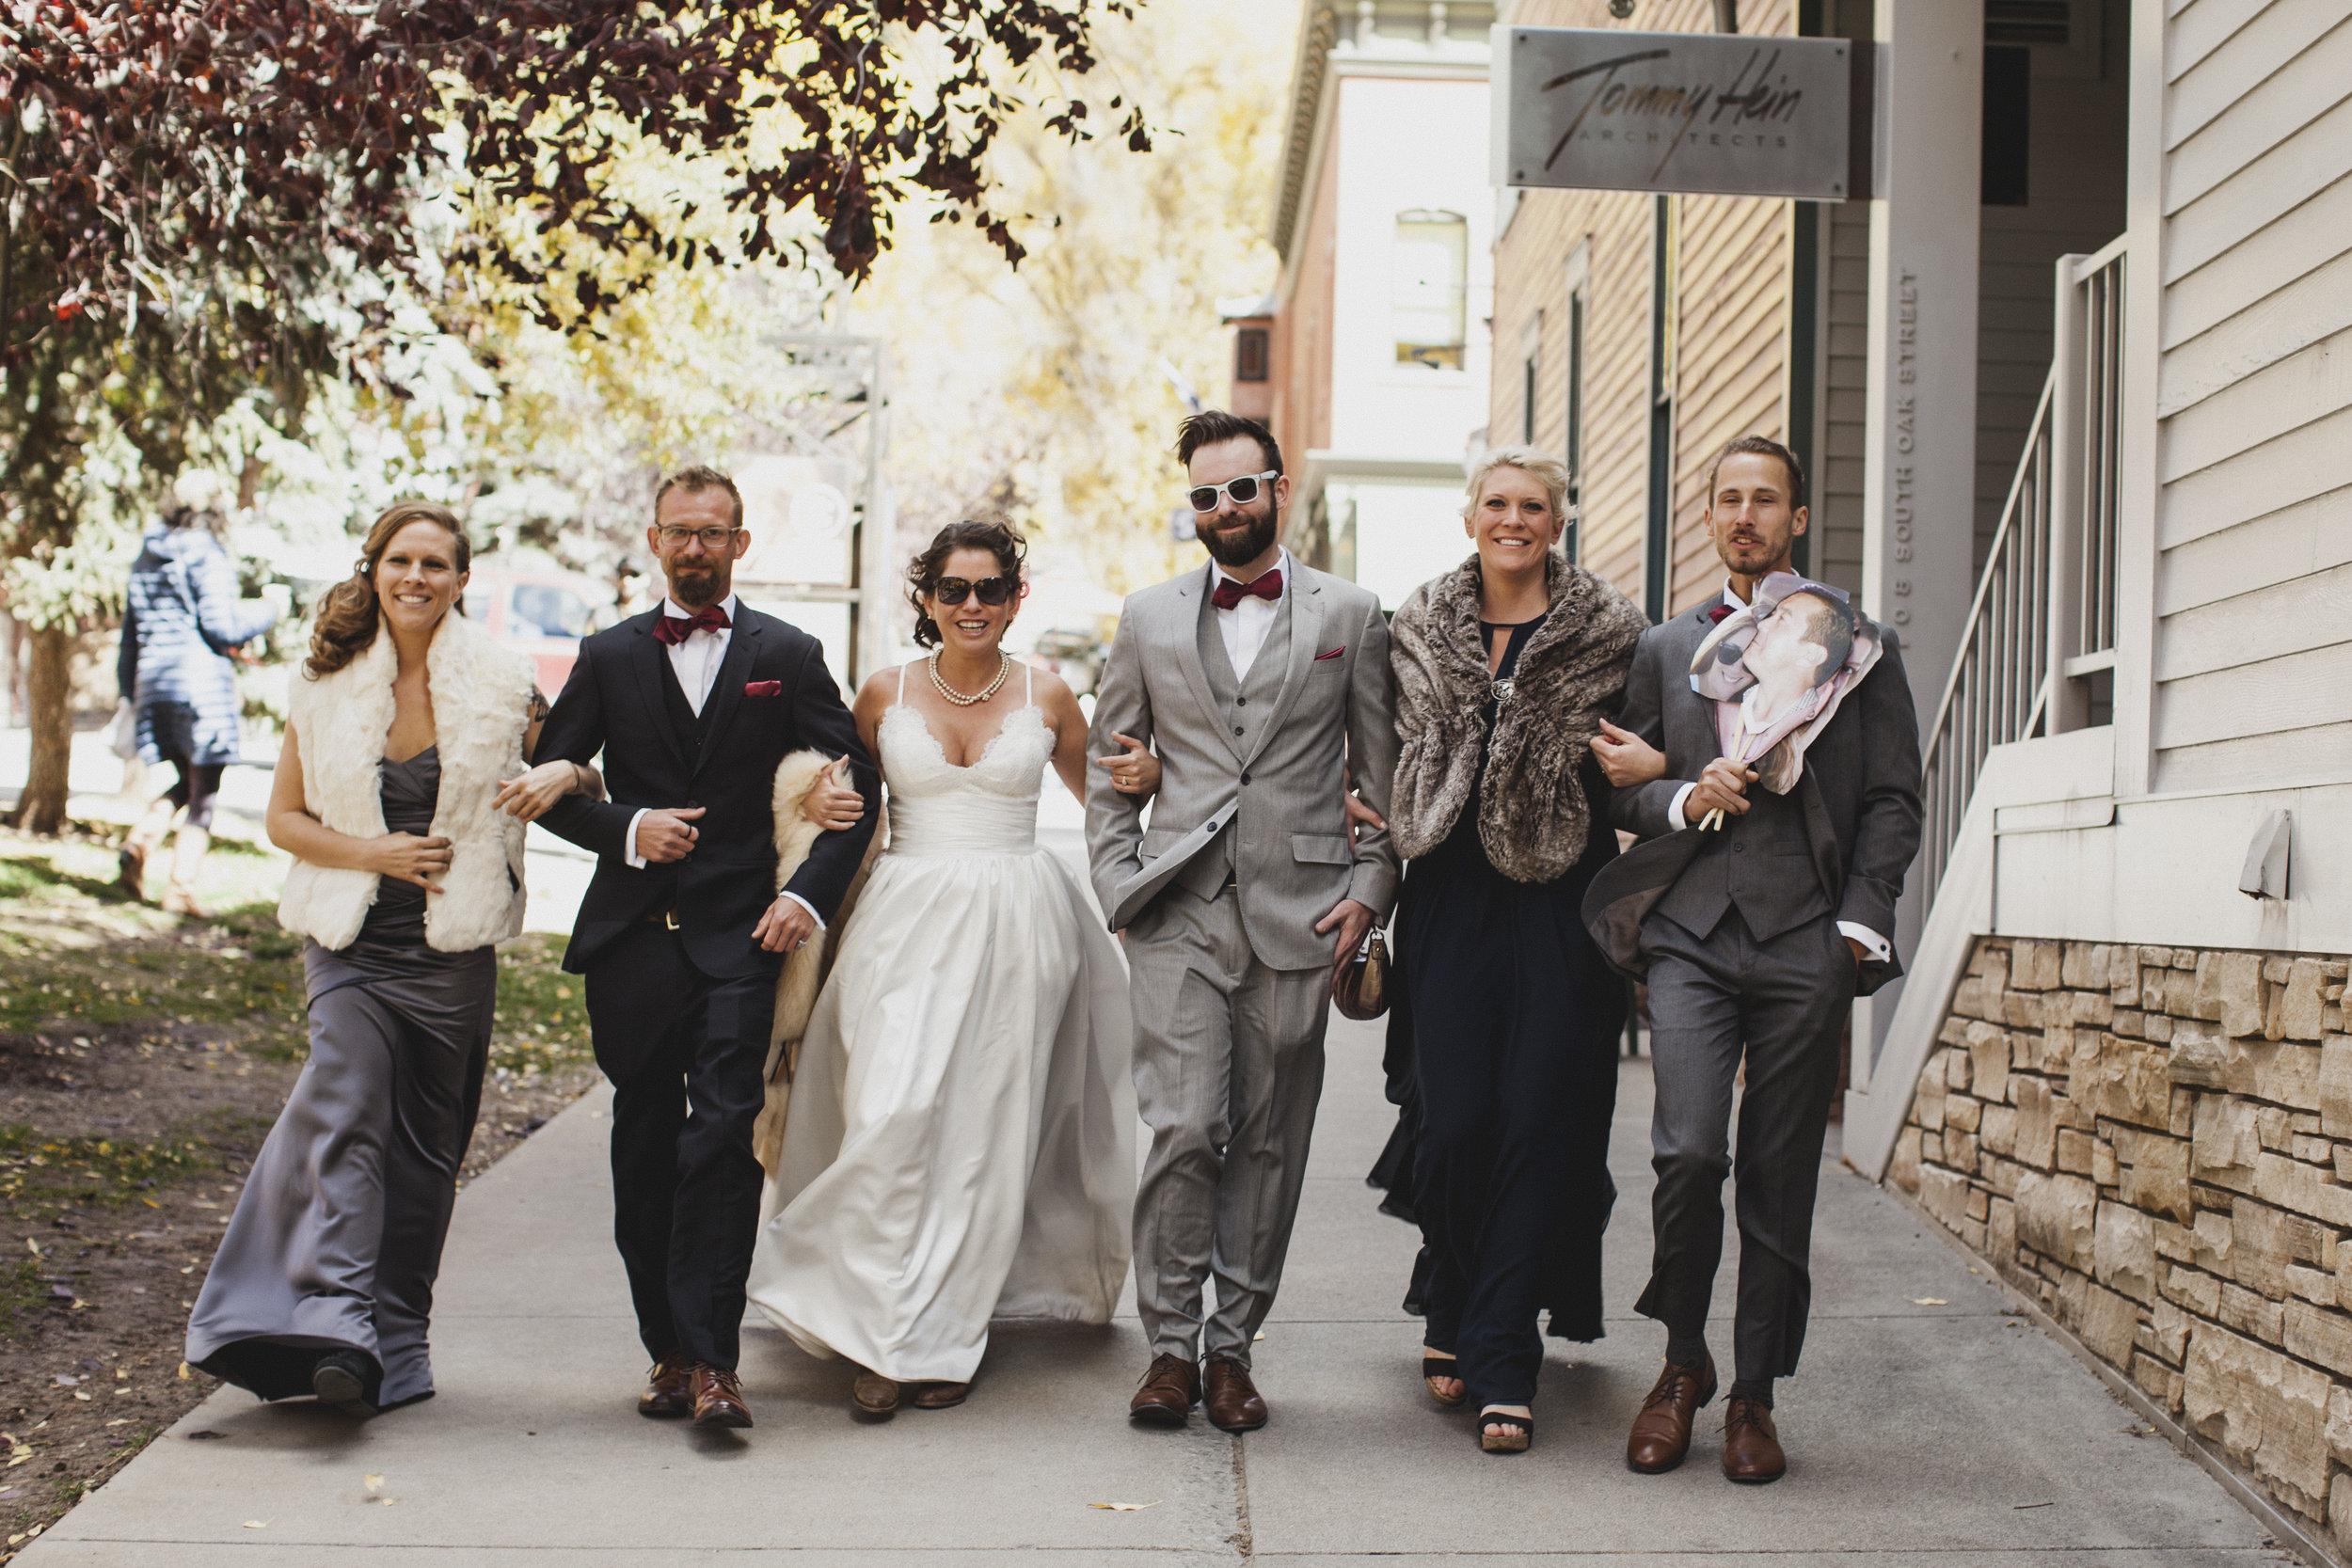 NE-LeahandAshtonphotography-Telluride-Wedding-Photography-6654.jpg